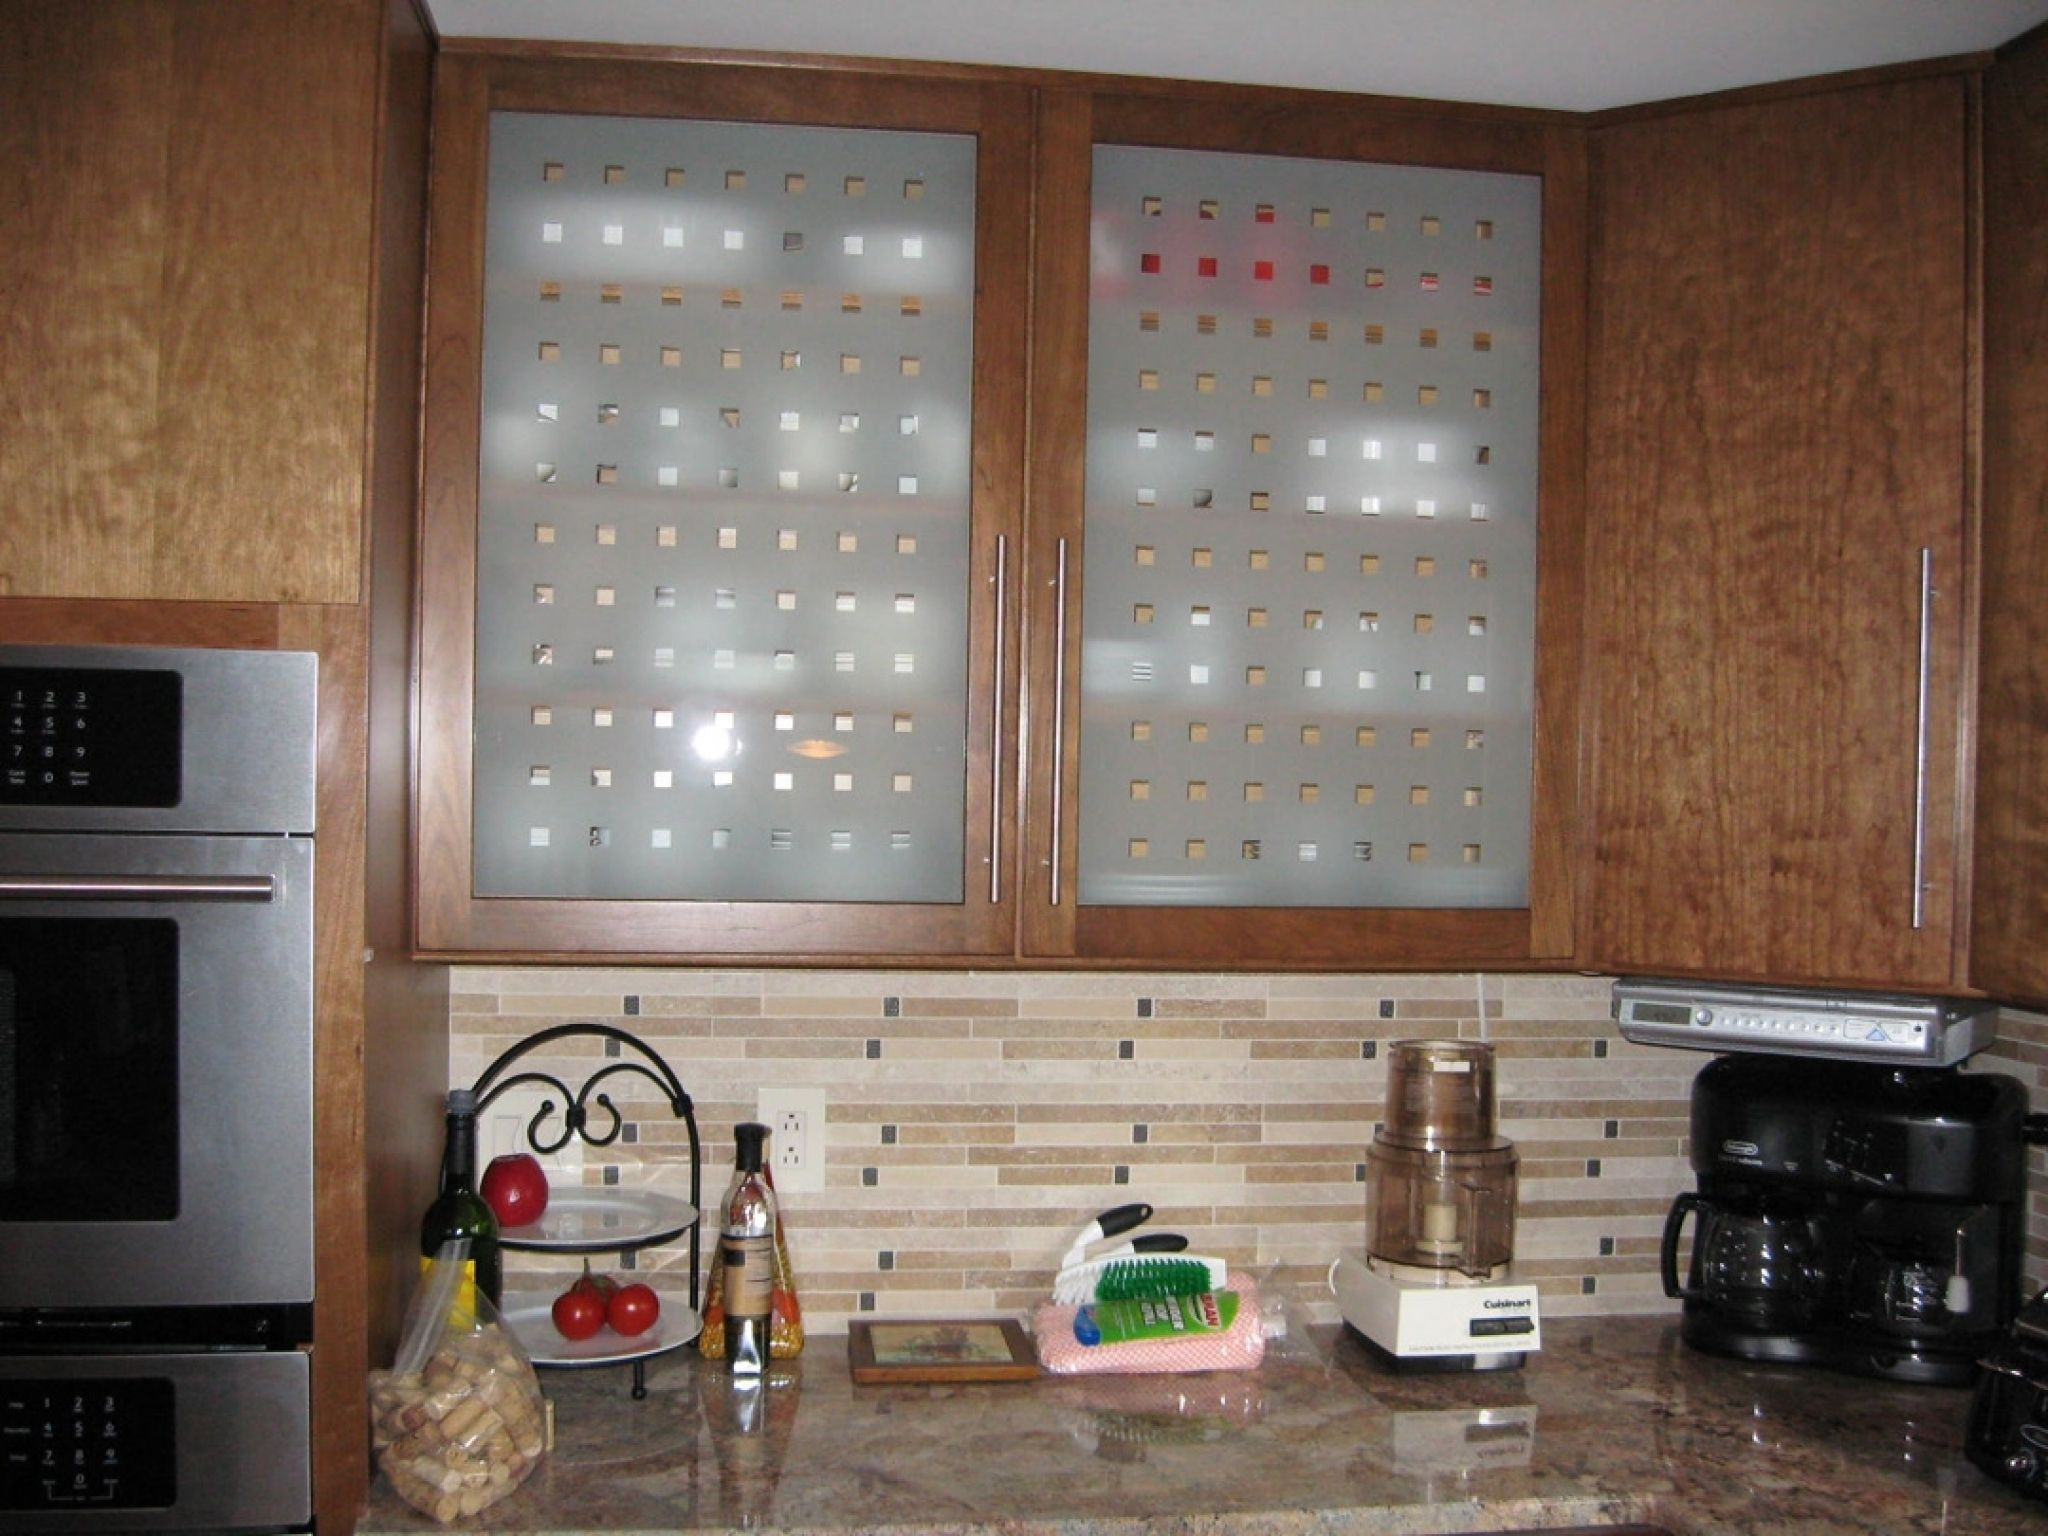 Best Kitchen Gallery: Etched Glass Kitchen Cabi Doors Kitchen Floor Vinyl Ideas of Etched Glass Kitchen Cabinet Doors on cal-ite.com